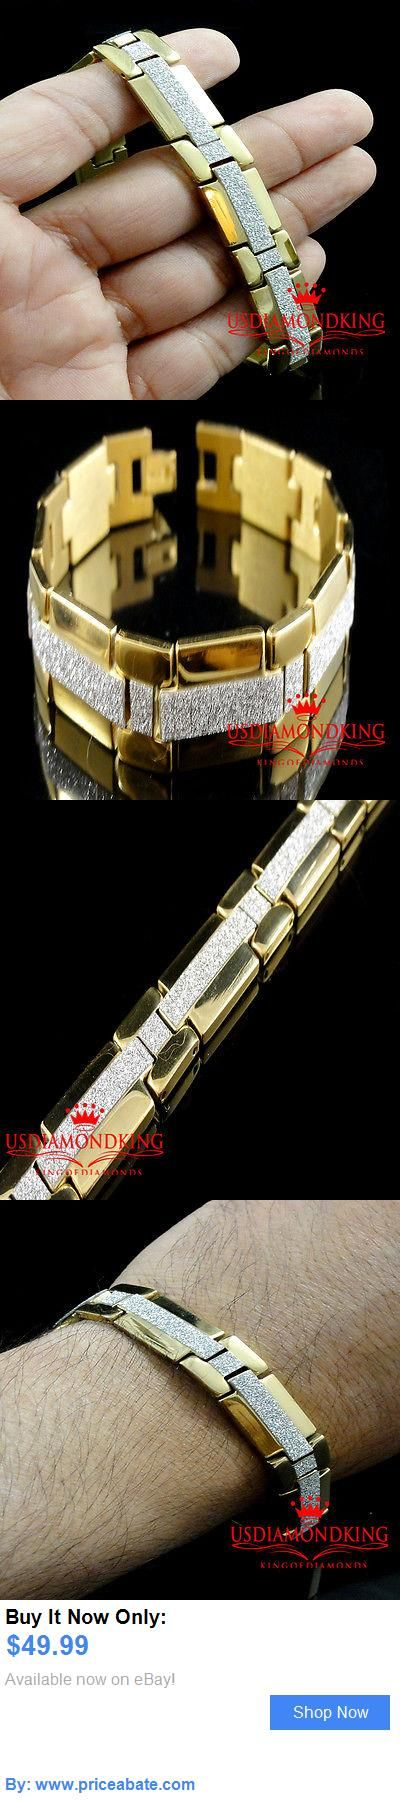 Men Jewelry: New 14K Yellow Gold Finish Men Women Stainless Steel Lab Diamond Bracelet 8 Inch BUY IT NOW ONLY: $49.99 #priceabateMenJewelry OR #priceabate